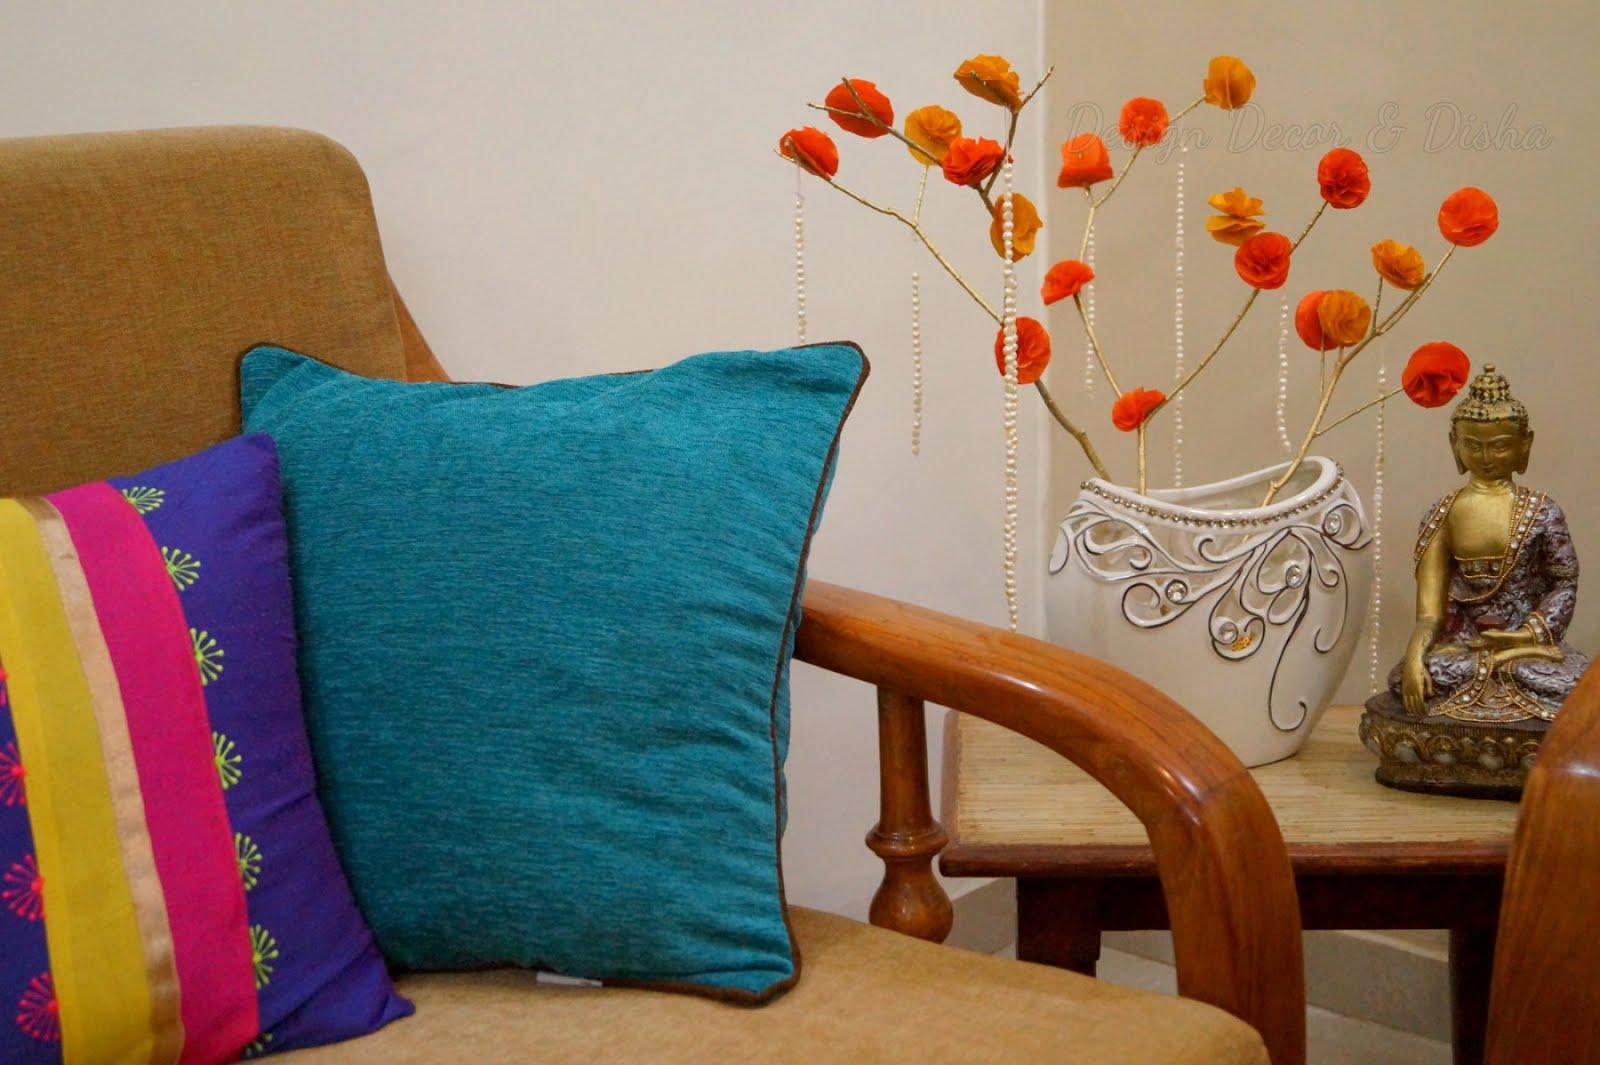 Design Decor Disha An Indian Design Decor Blog Last Minute Diwali Diy Home Decor Ideas